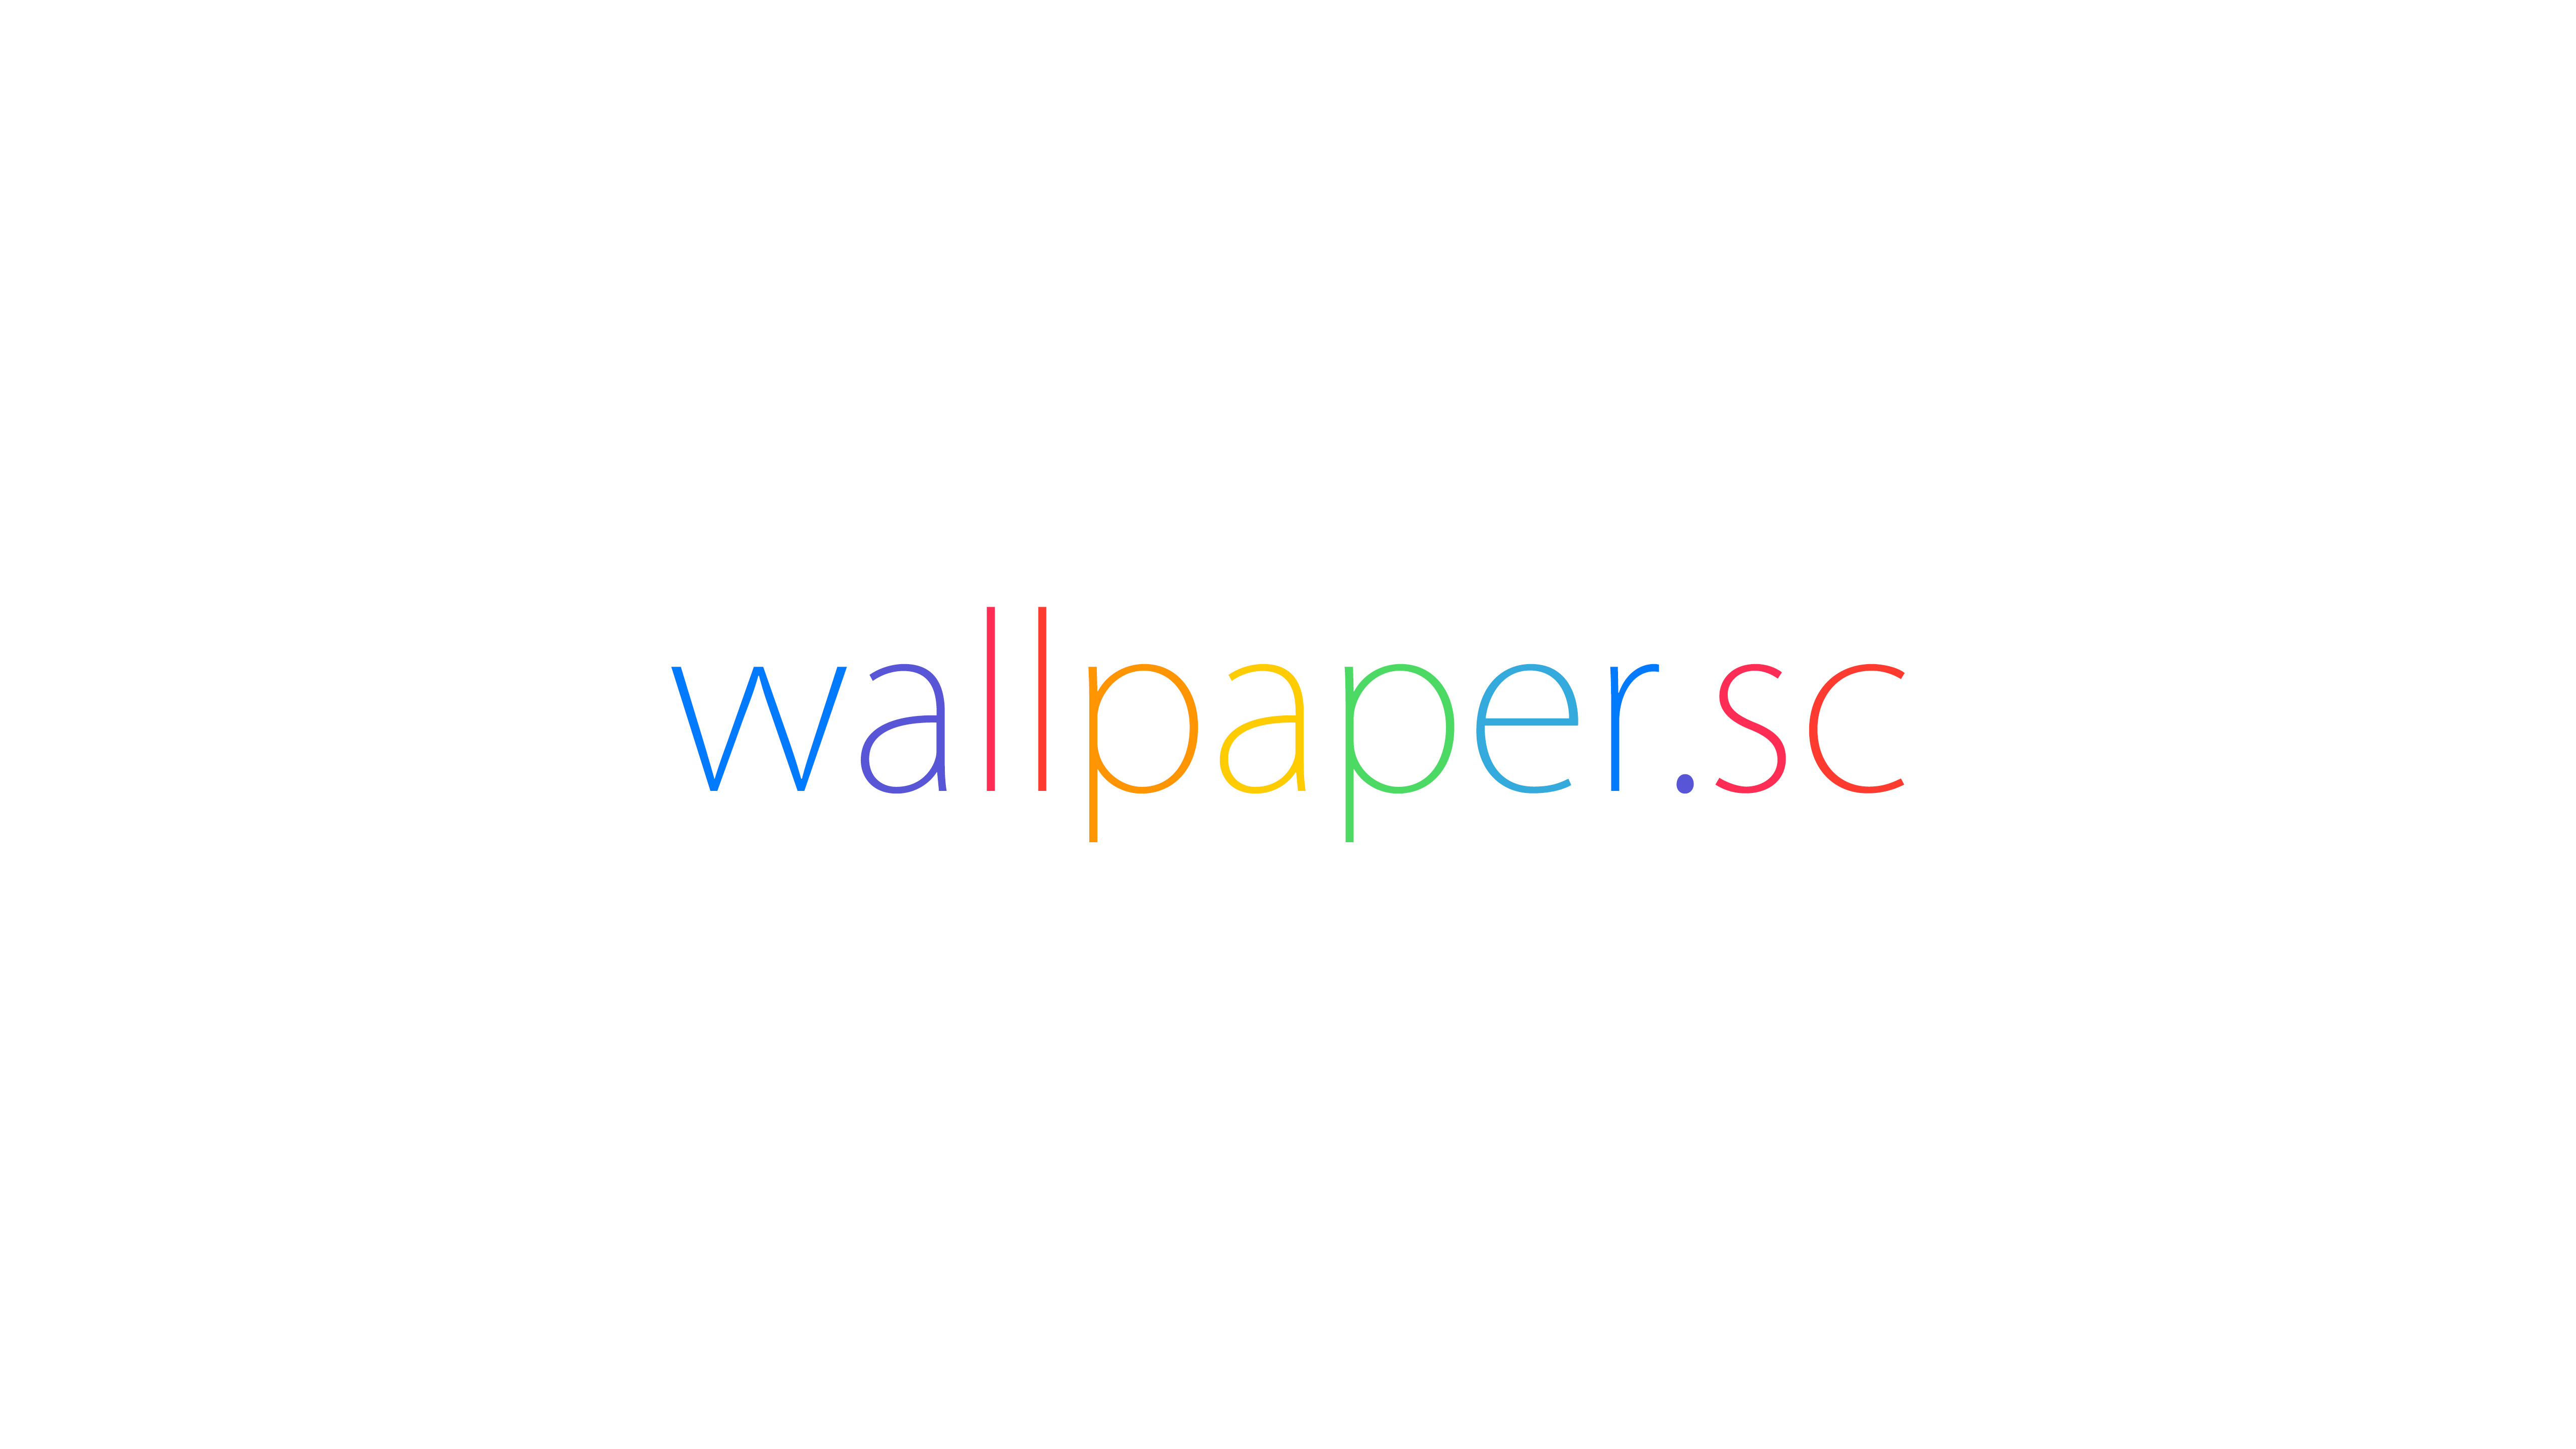 Wallpaper Scロゴ白 Wallpaper Sc Desktop